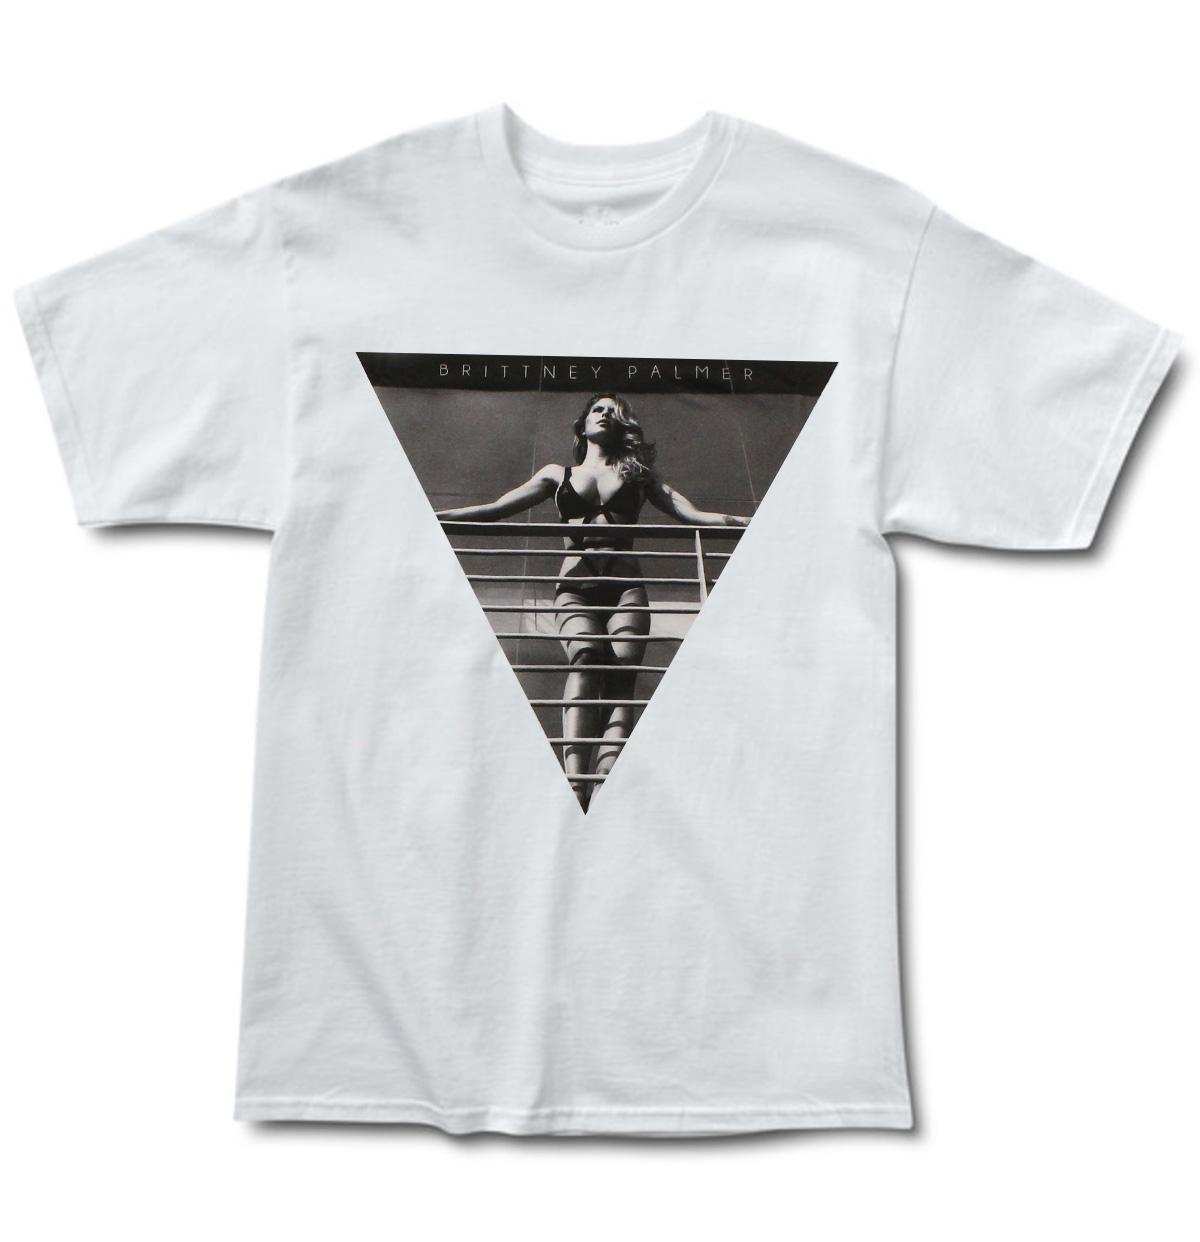 Brittney-Triangle